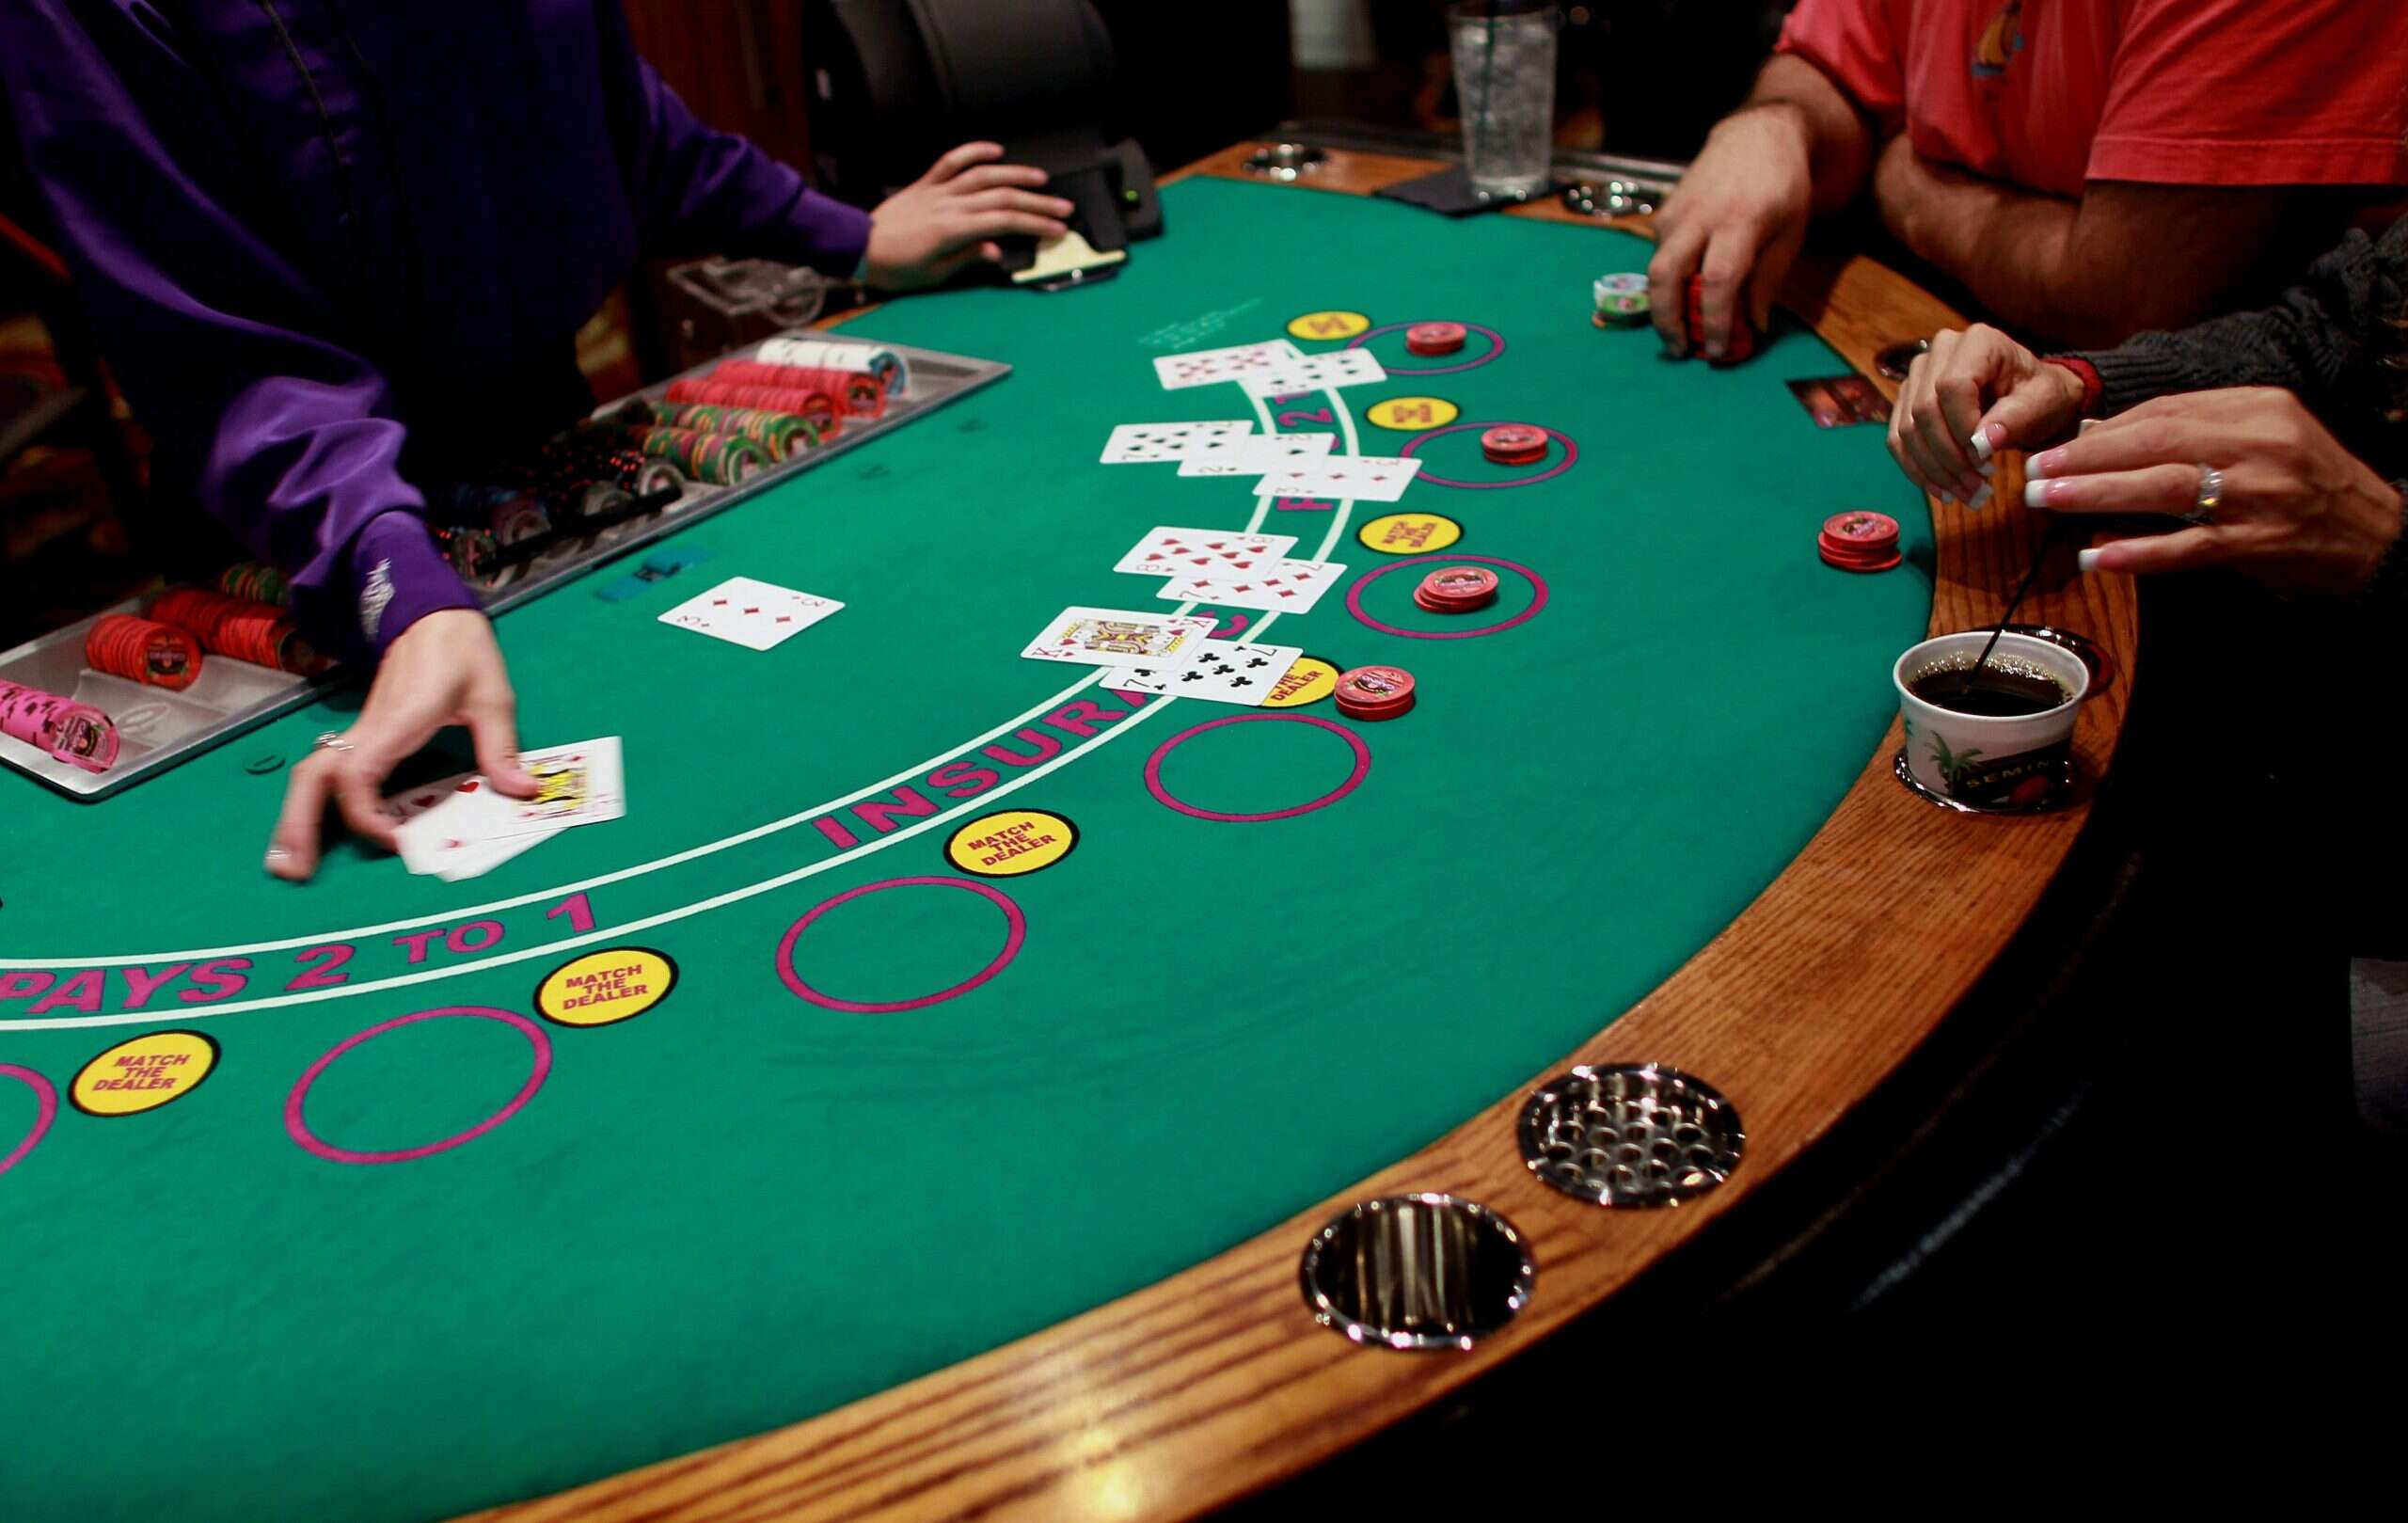 Gambling Advertisements